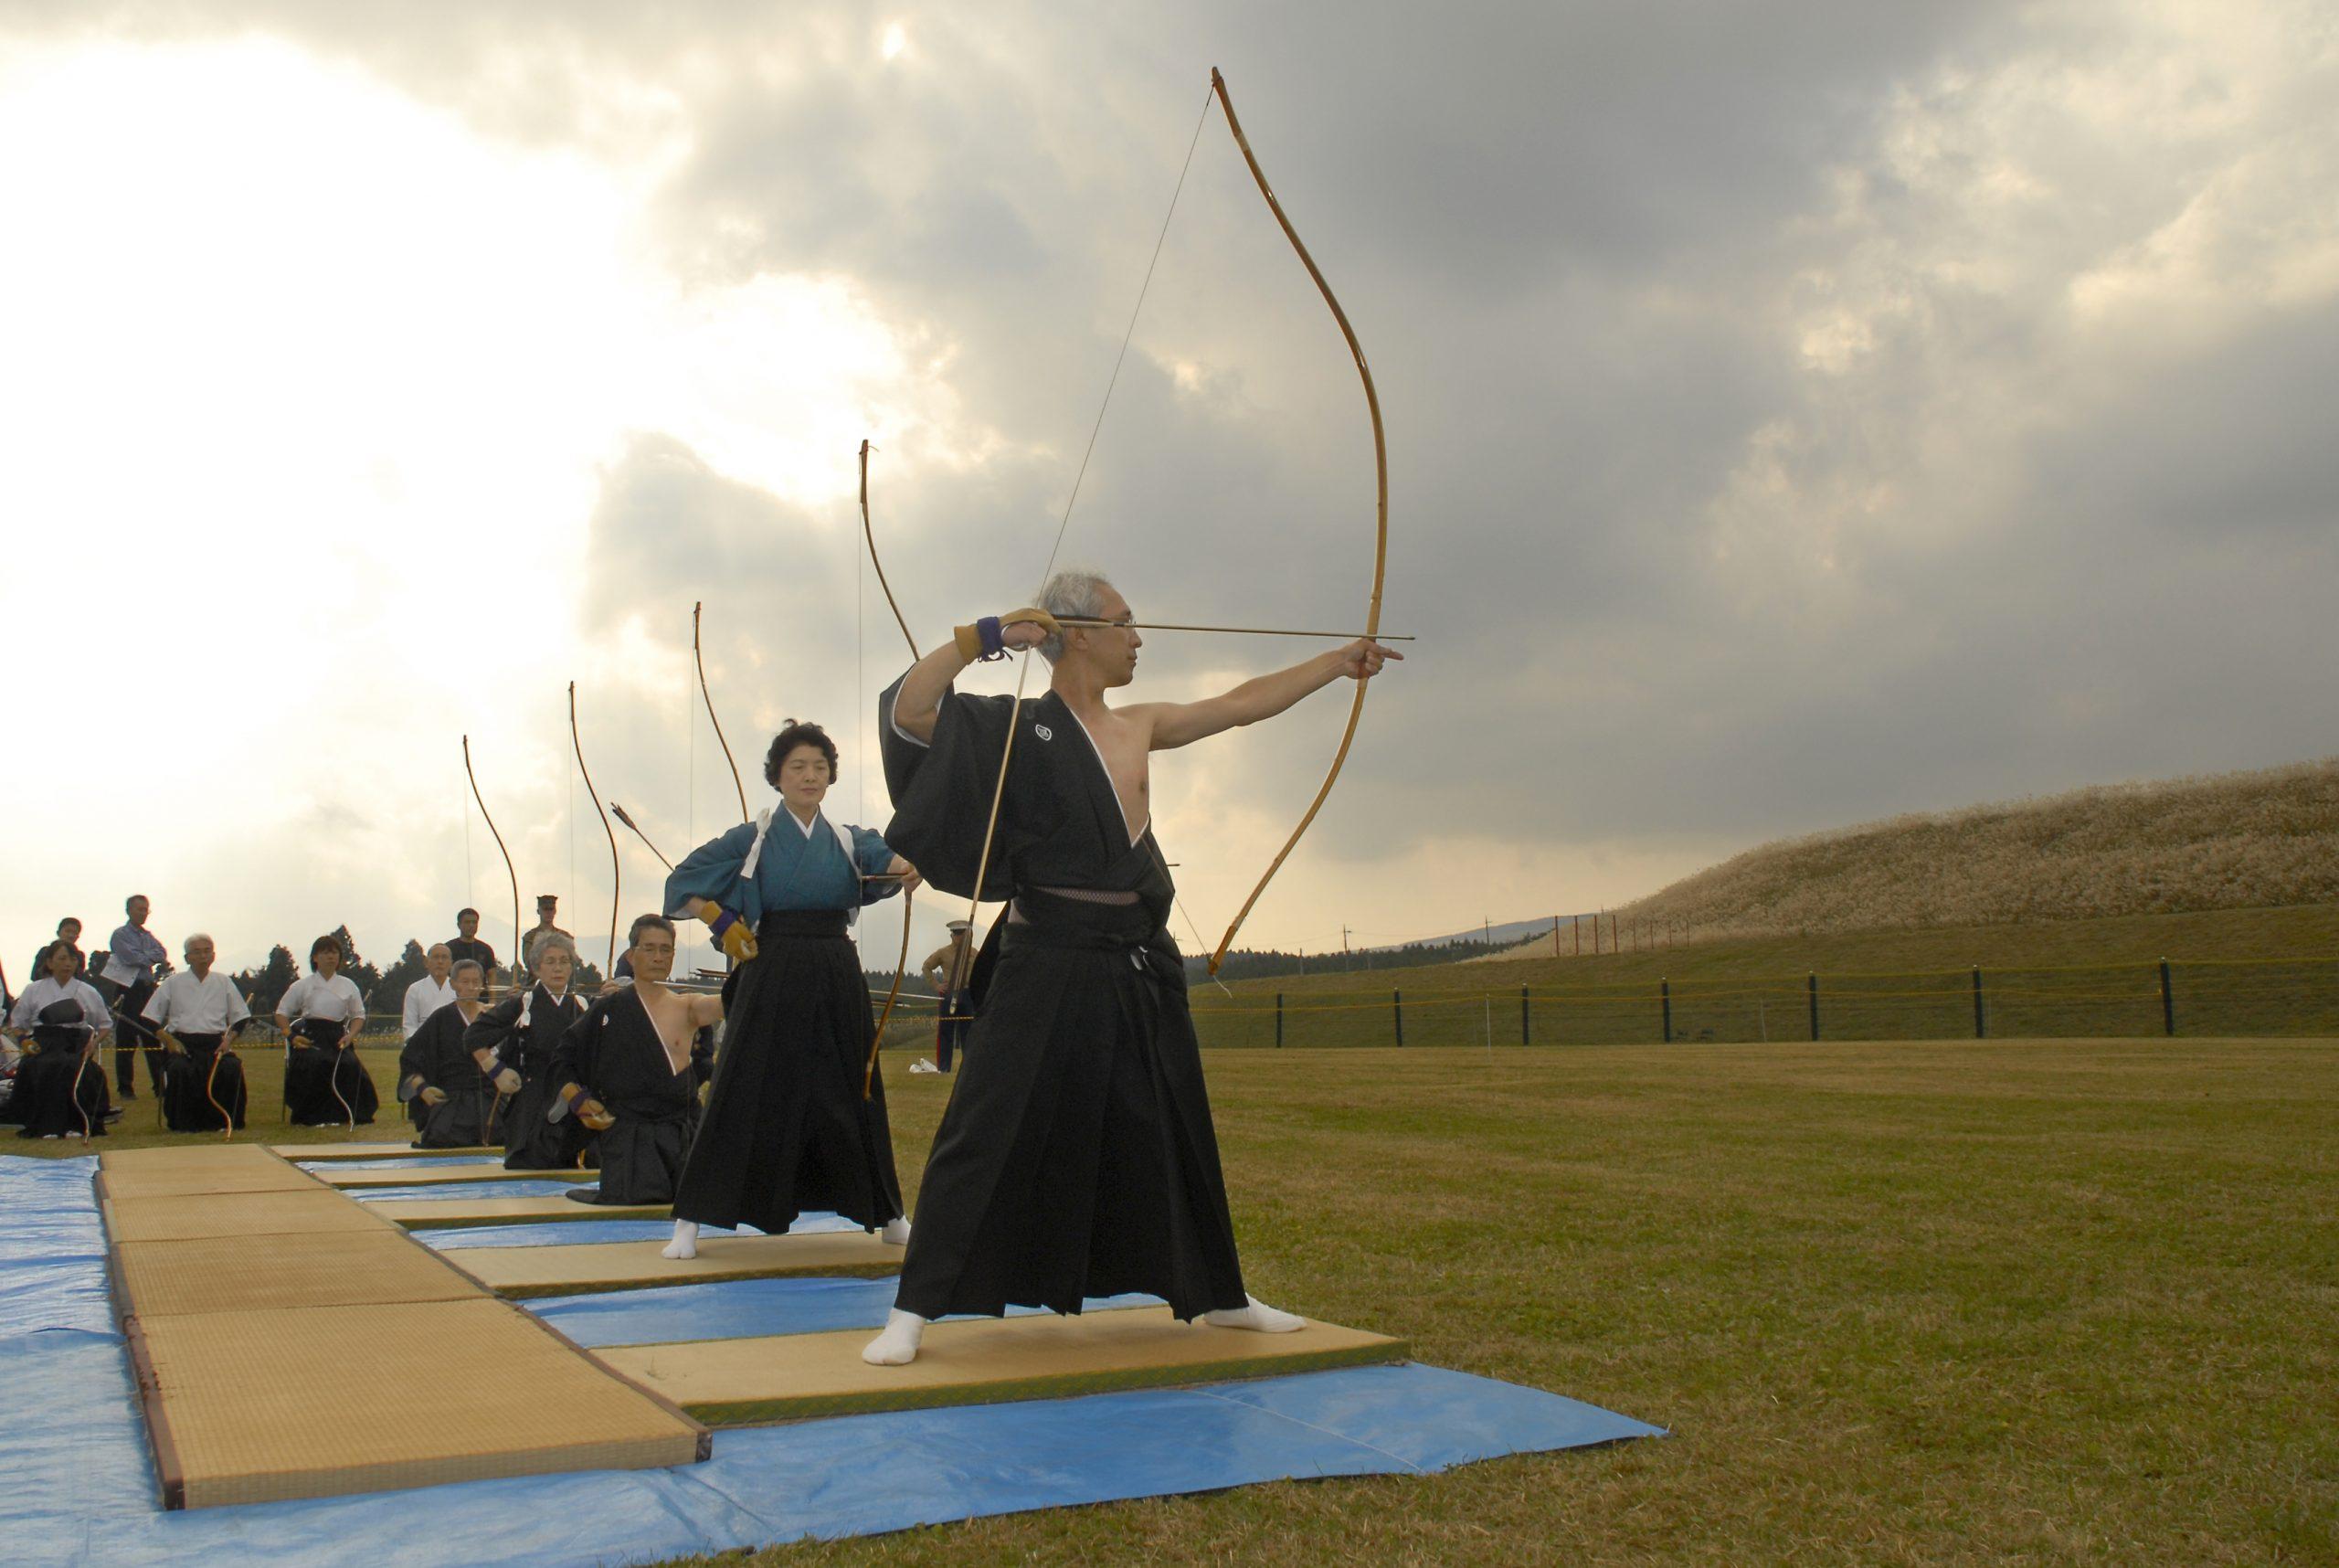 Kyudo: Japanese Archery Practice